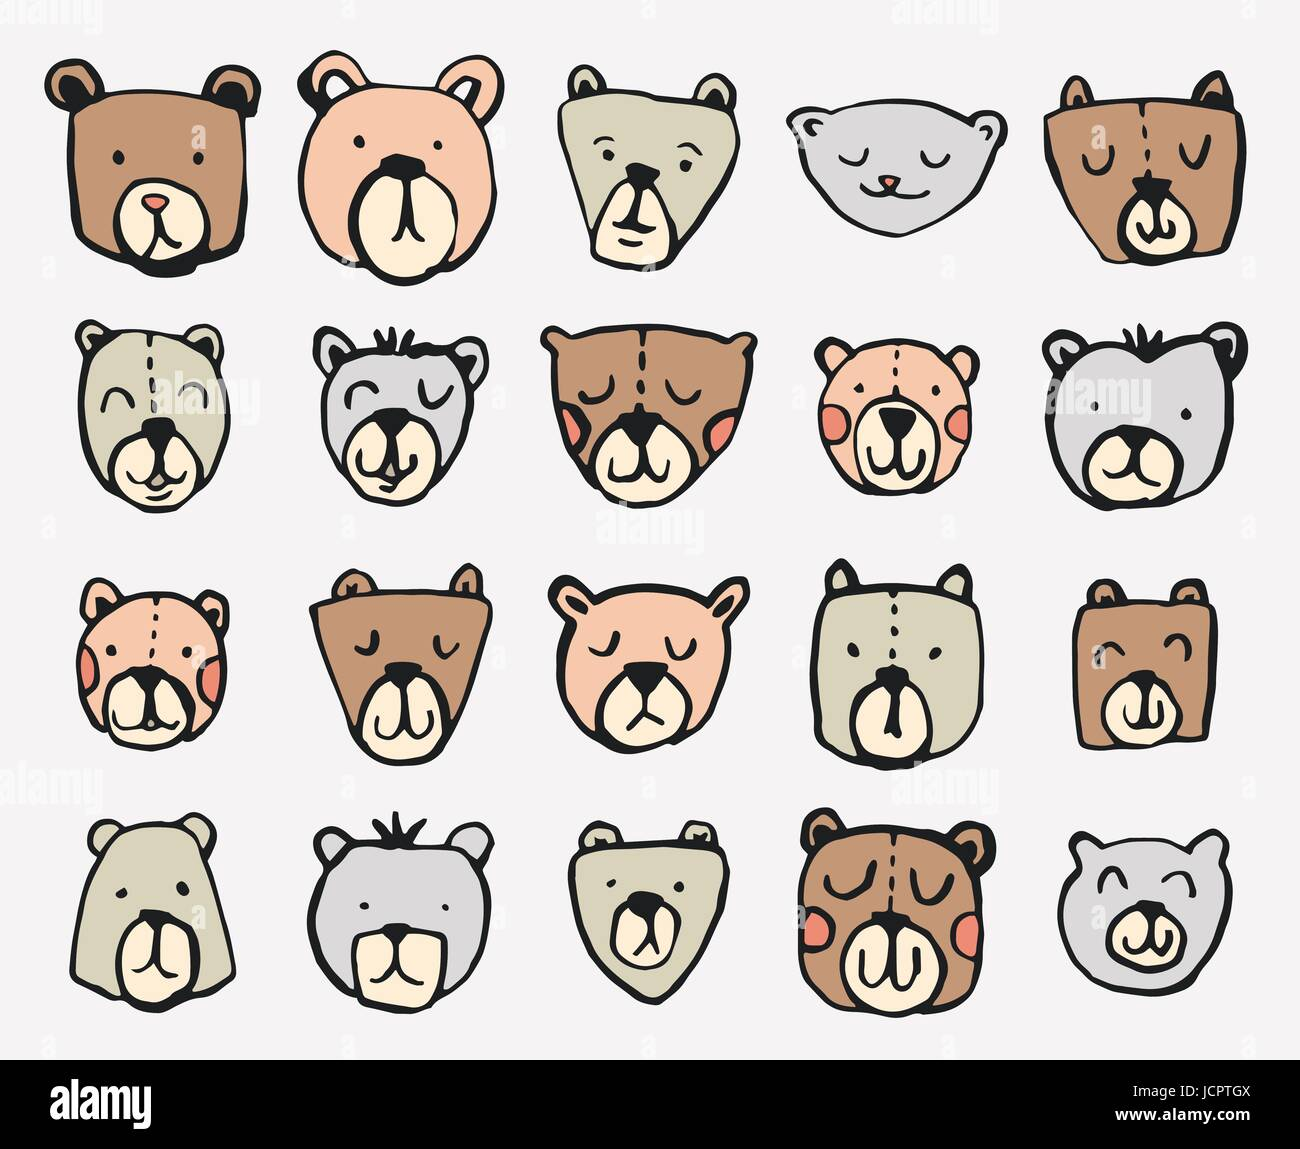 Vector icon set of teddy bears - Stock Vector